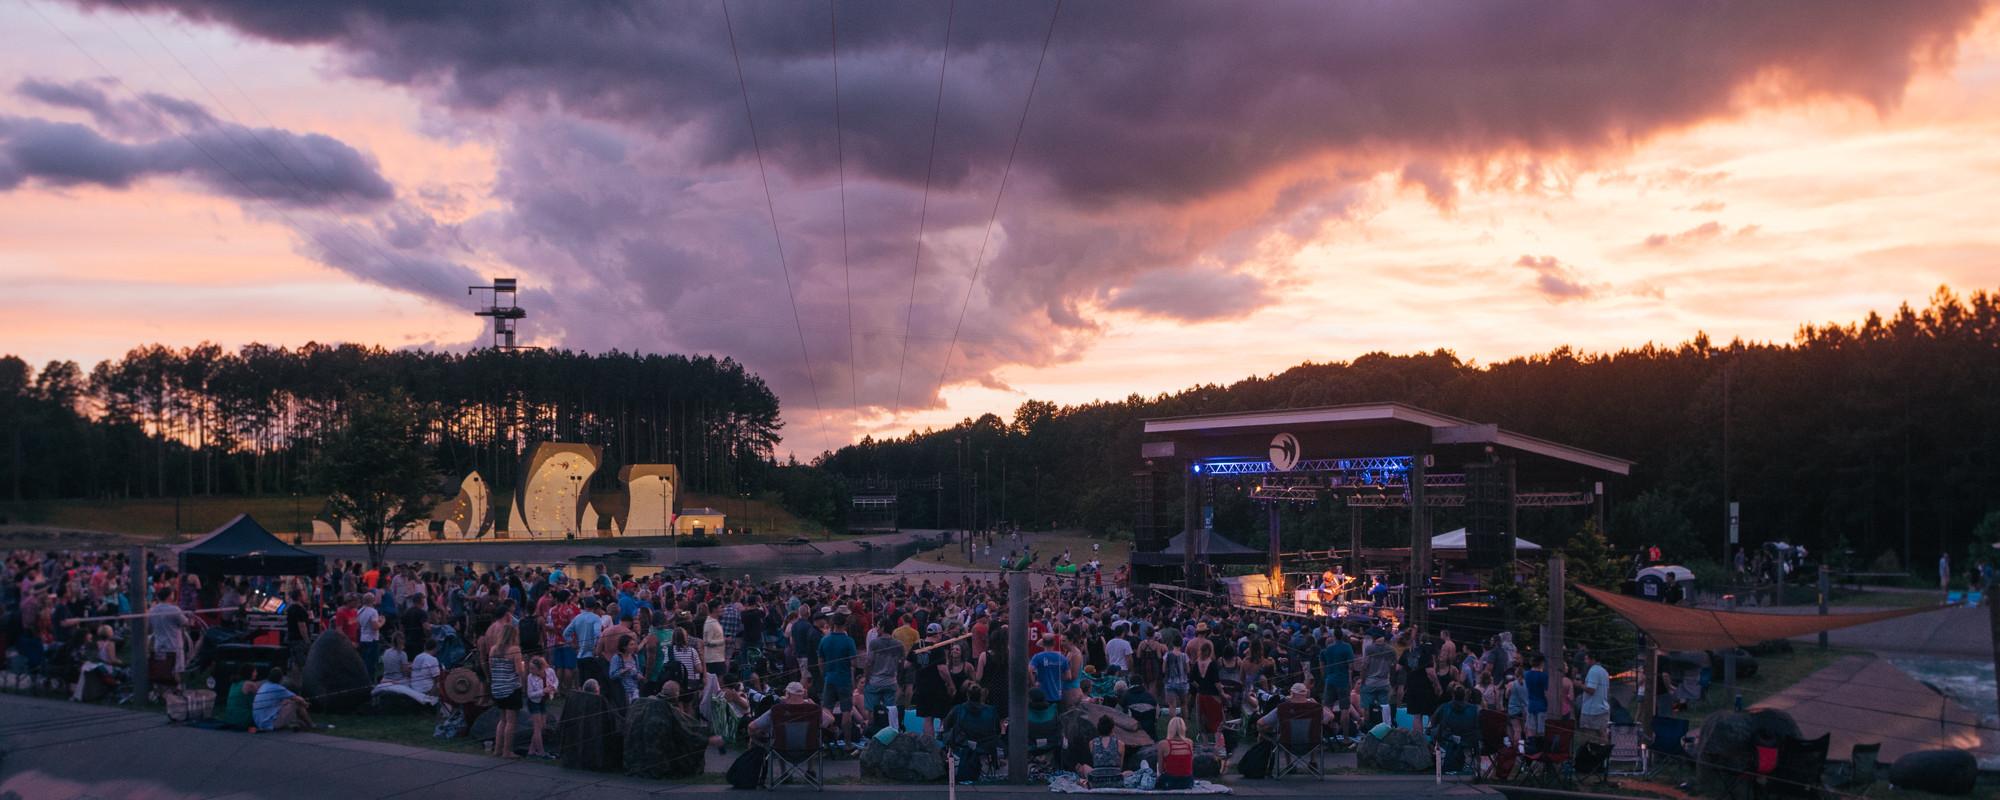 Concerts at USNWC.jpg